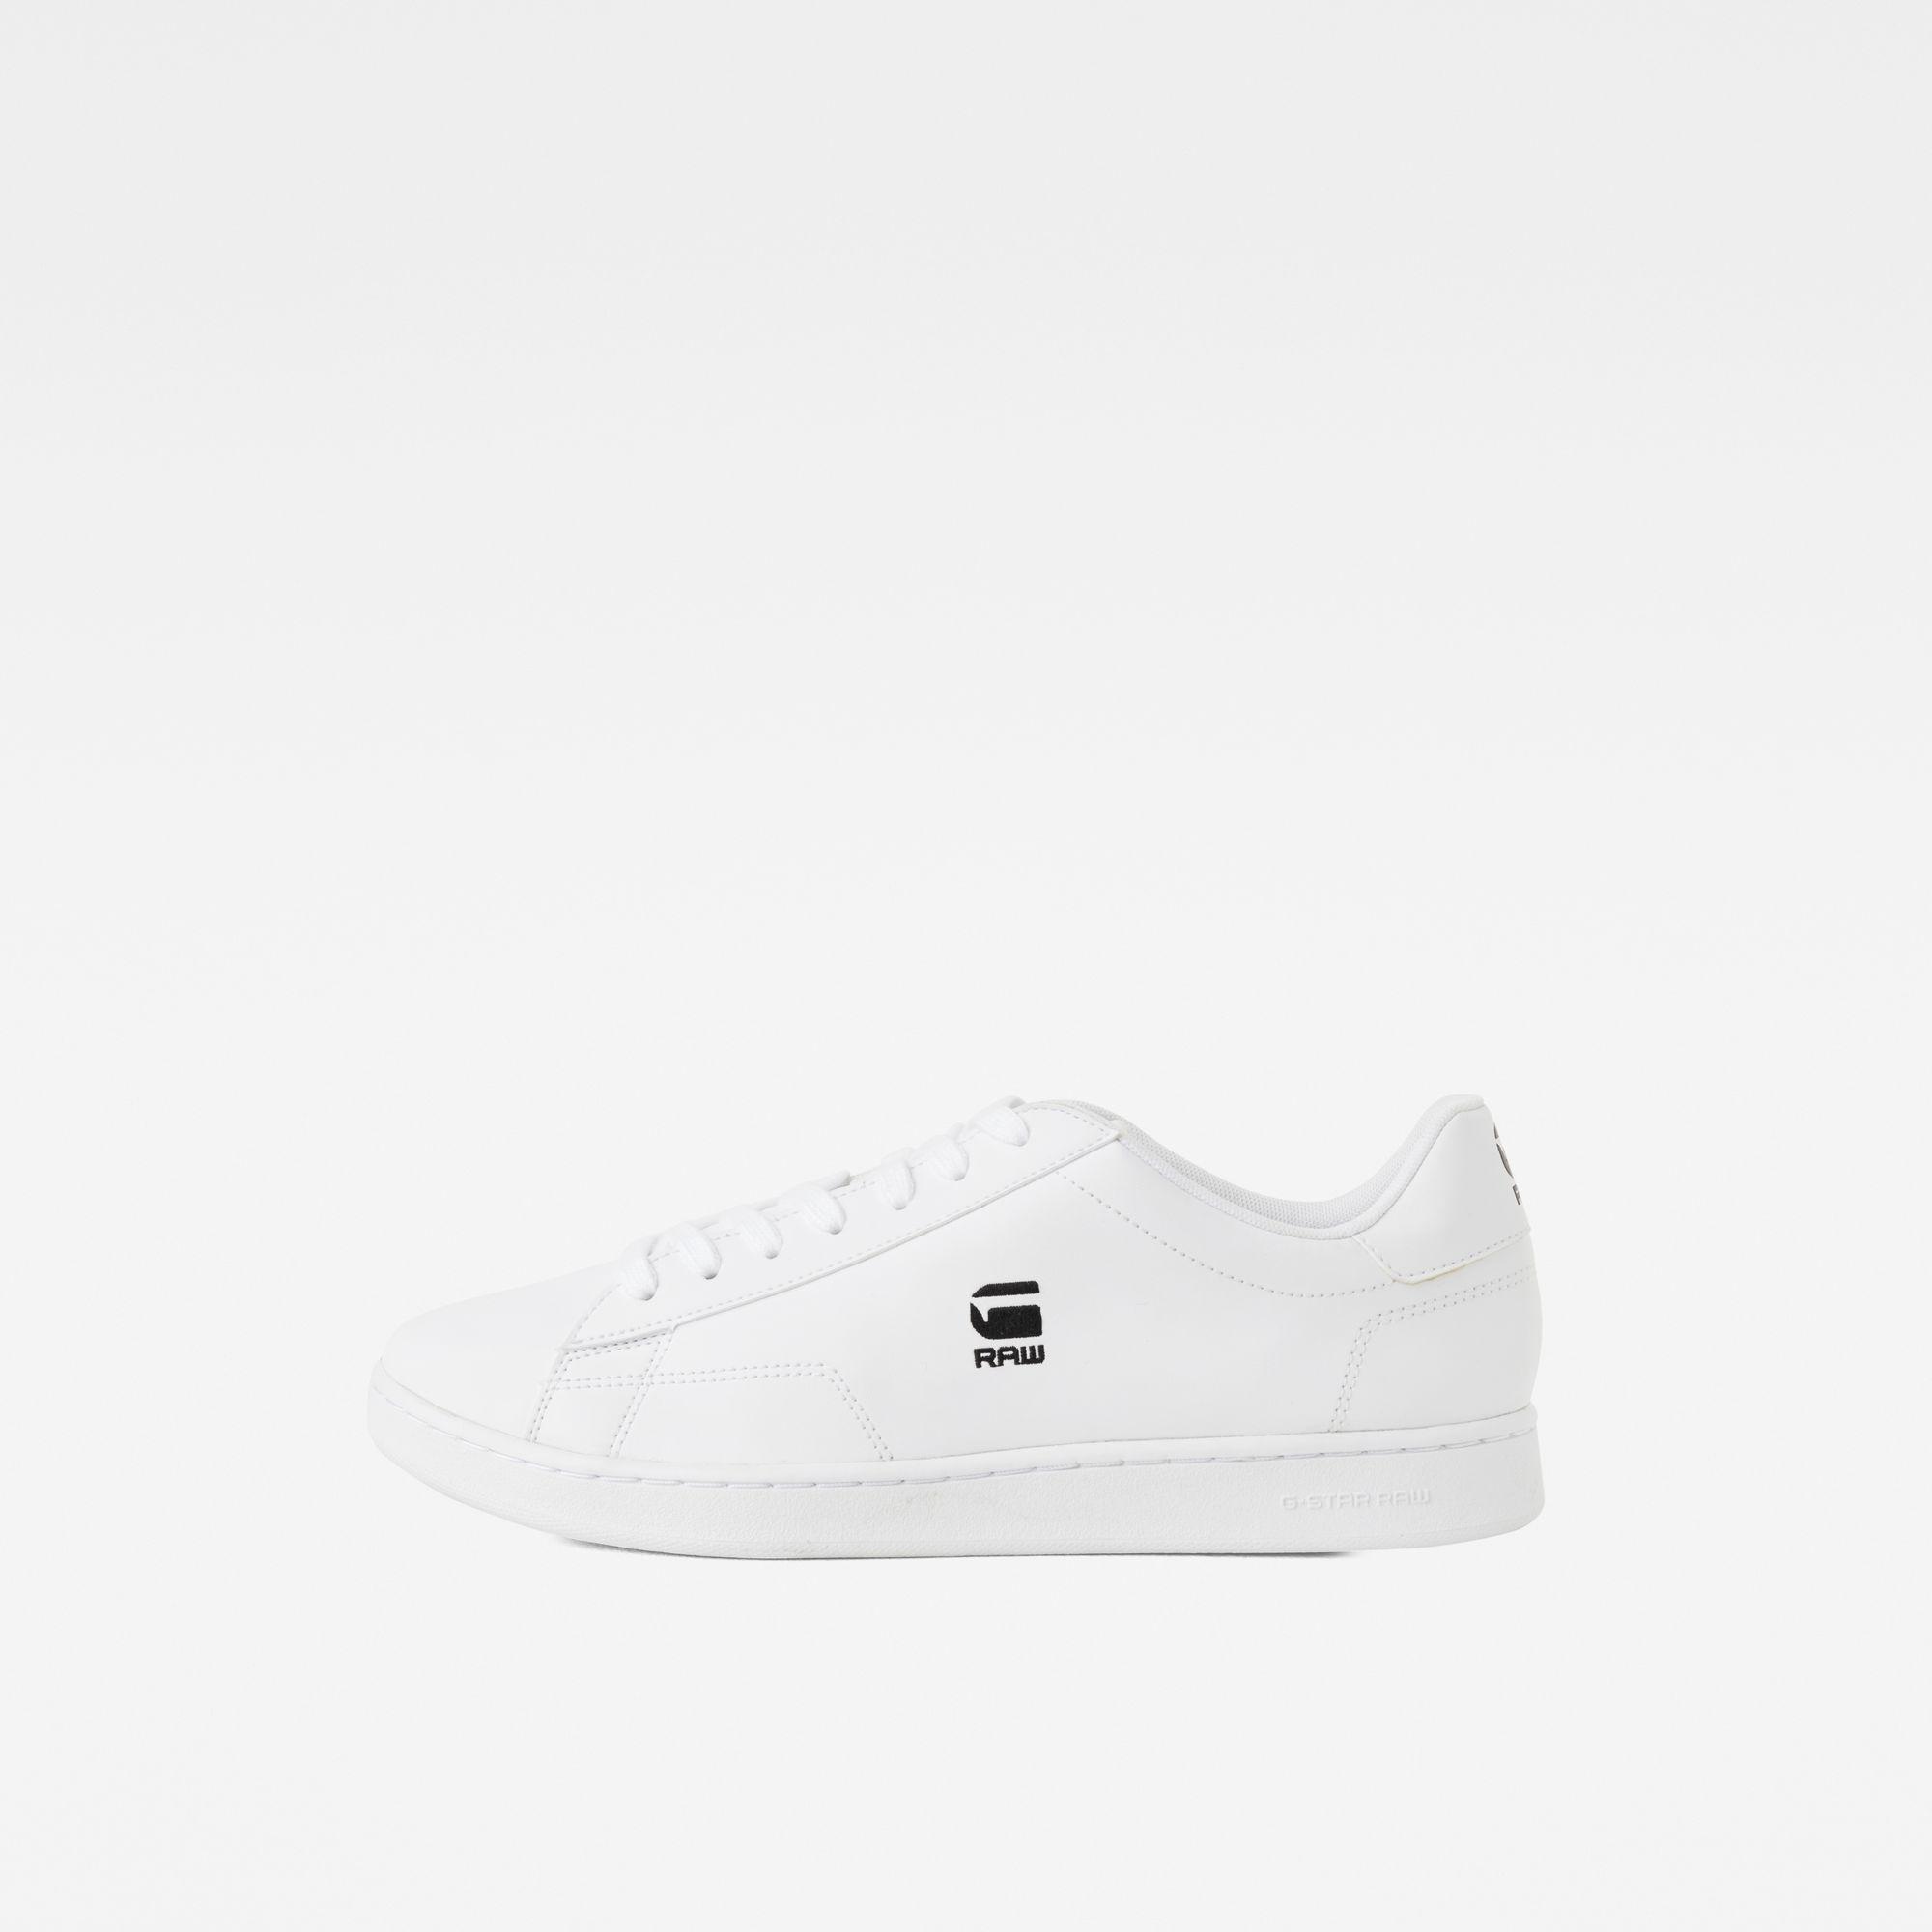 G-Star RAW Heren Cadet Sneakers Wit